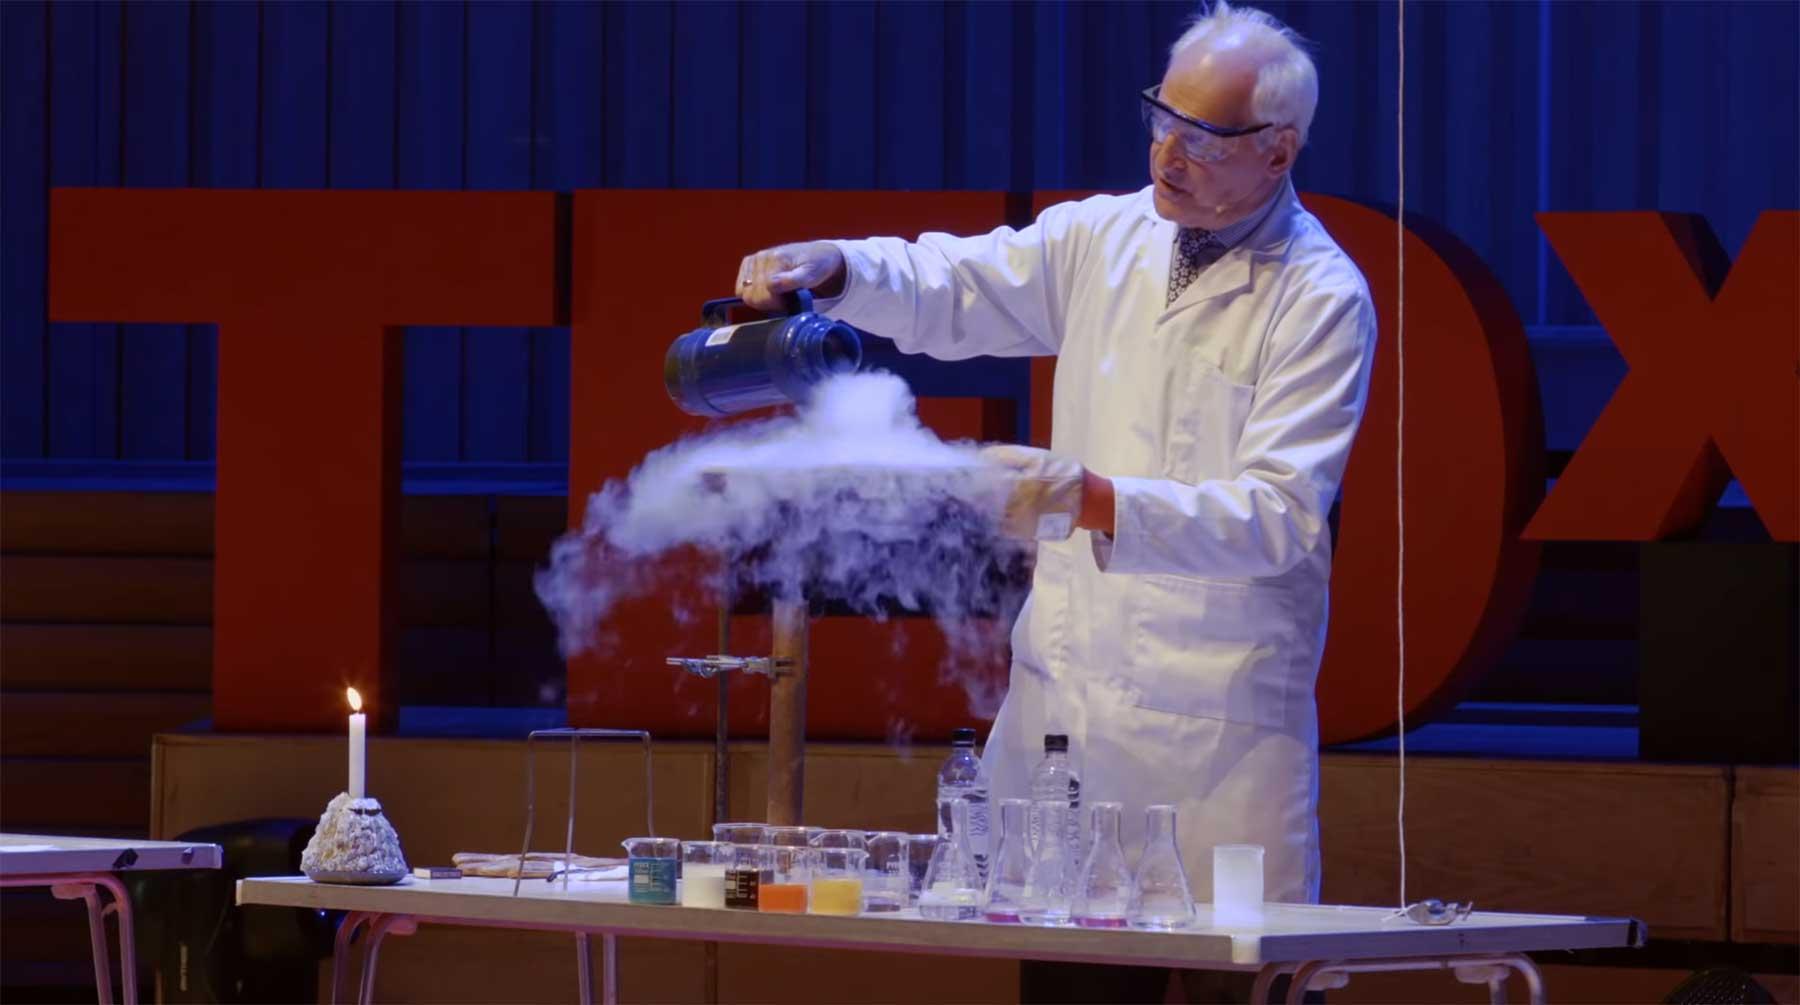 25 Chemie-Experimente in 15 Minuten